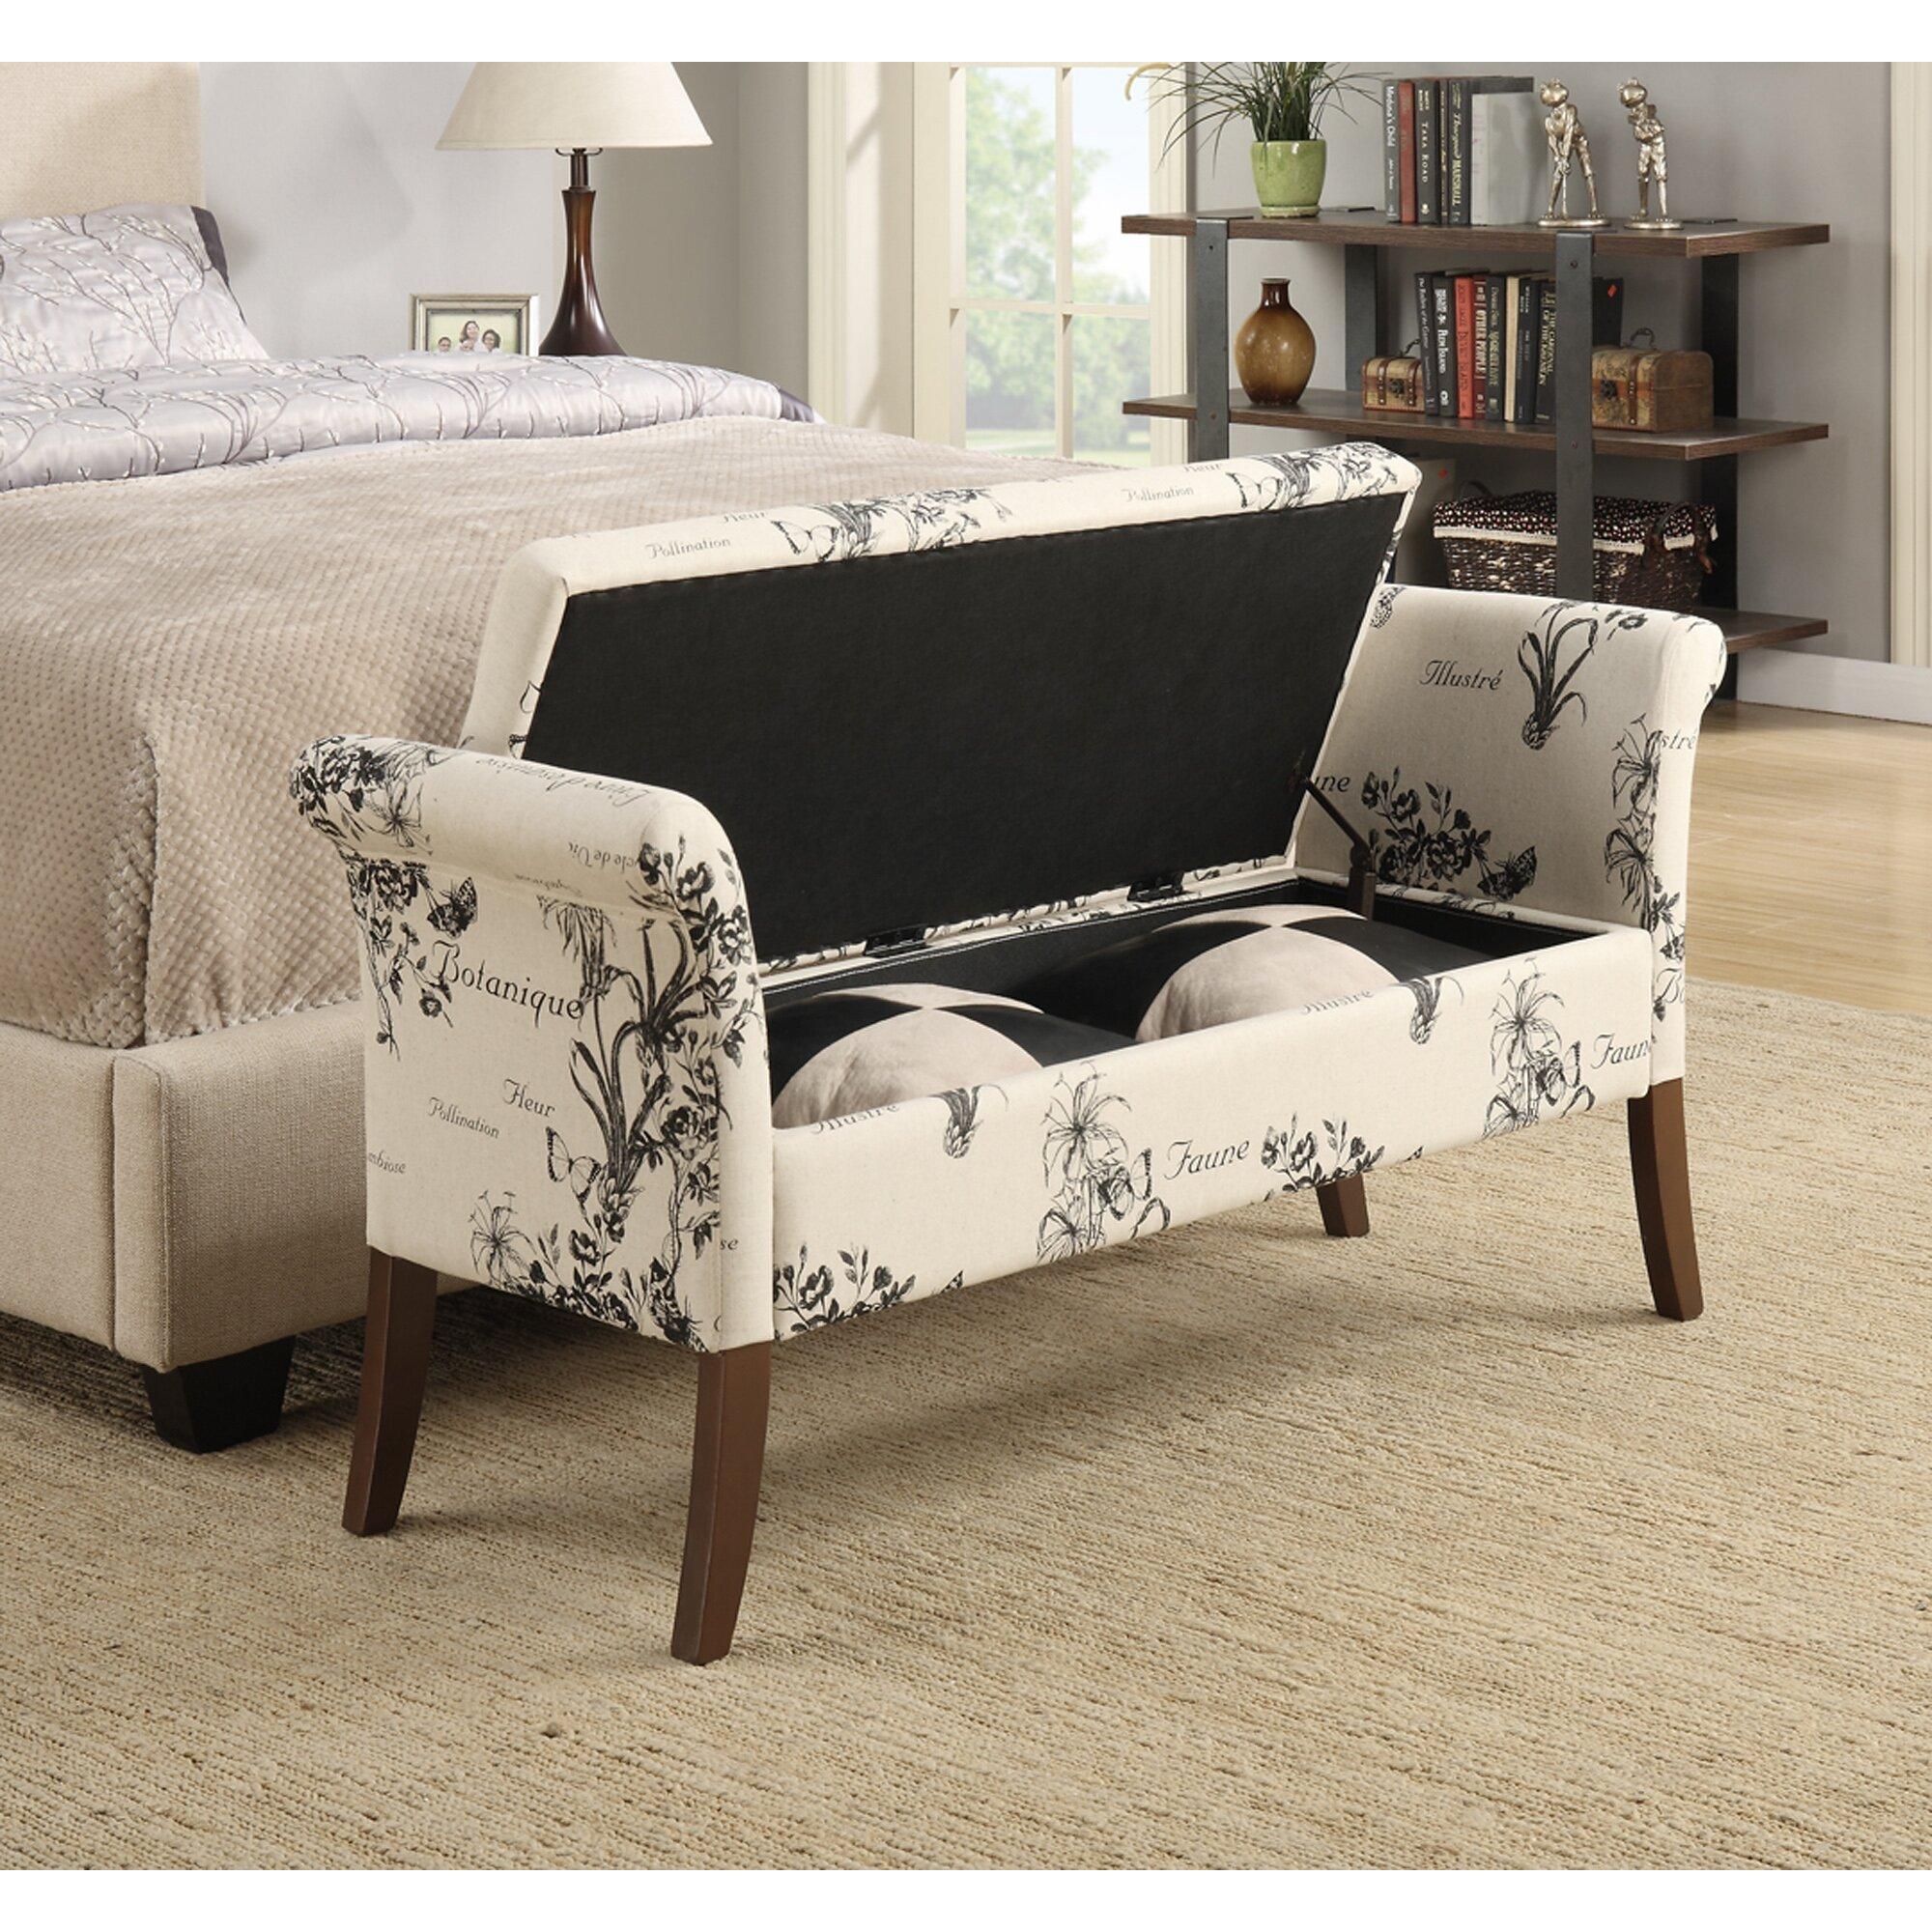 alcott hill eldon two seat storage bedroom bench reviews. Black Bedroom Furniture Sets. Home Design Ideas